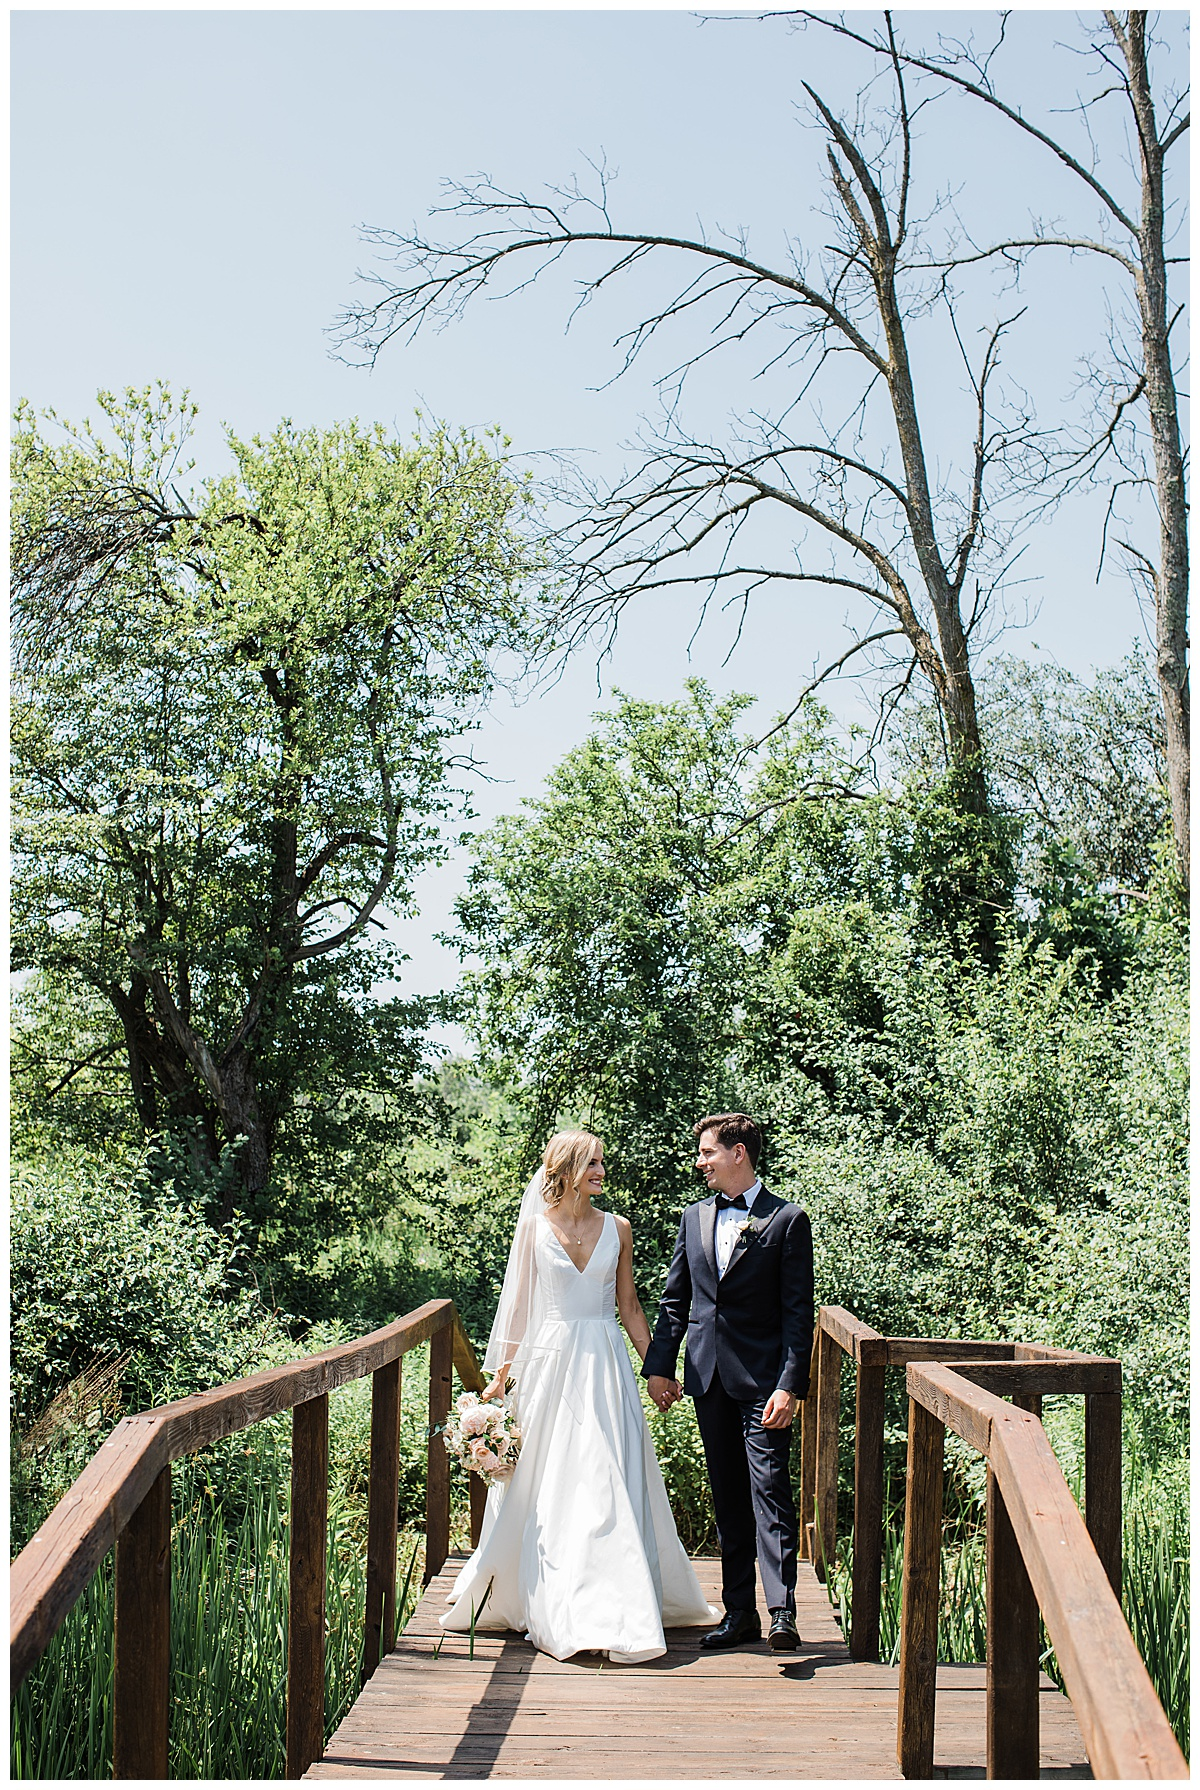 Bride and groom walking toward camera across bridge surrounded by trees  Toronto wedding photographer  3photography